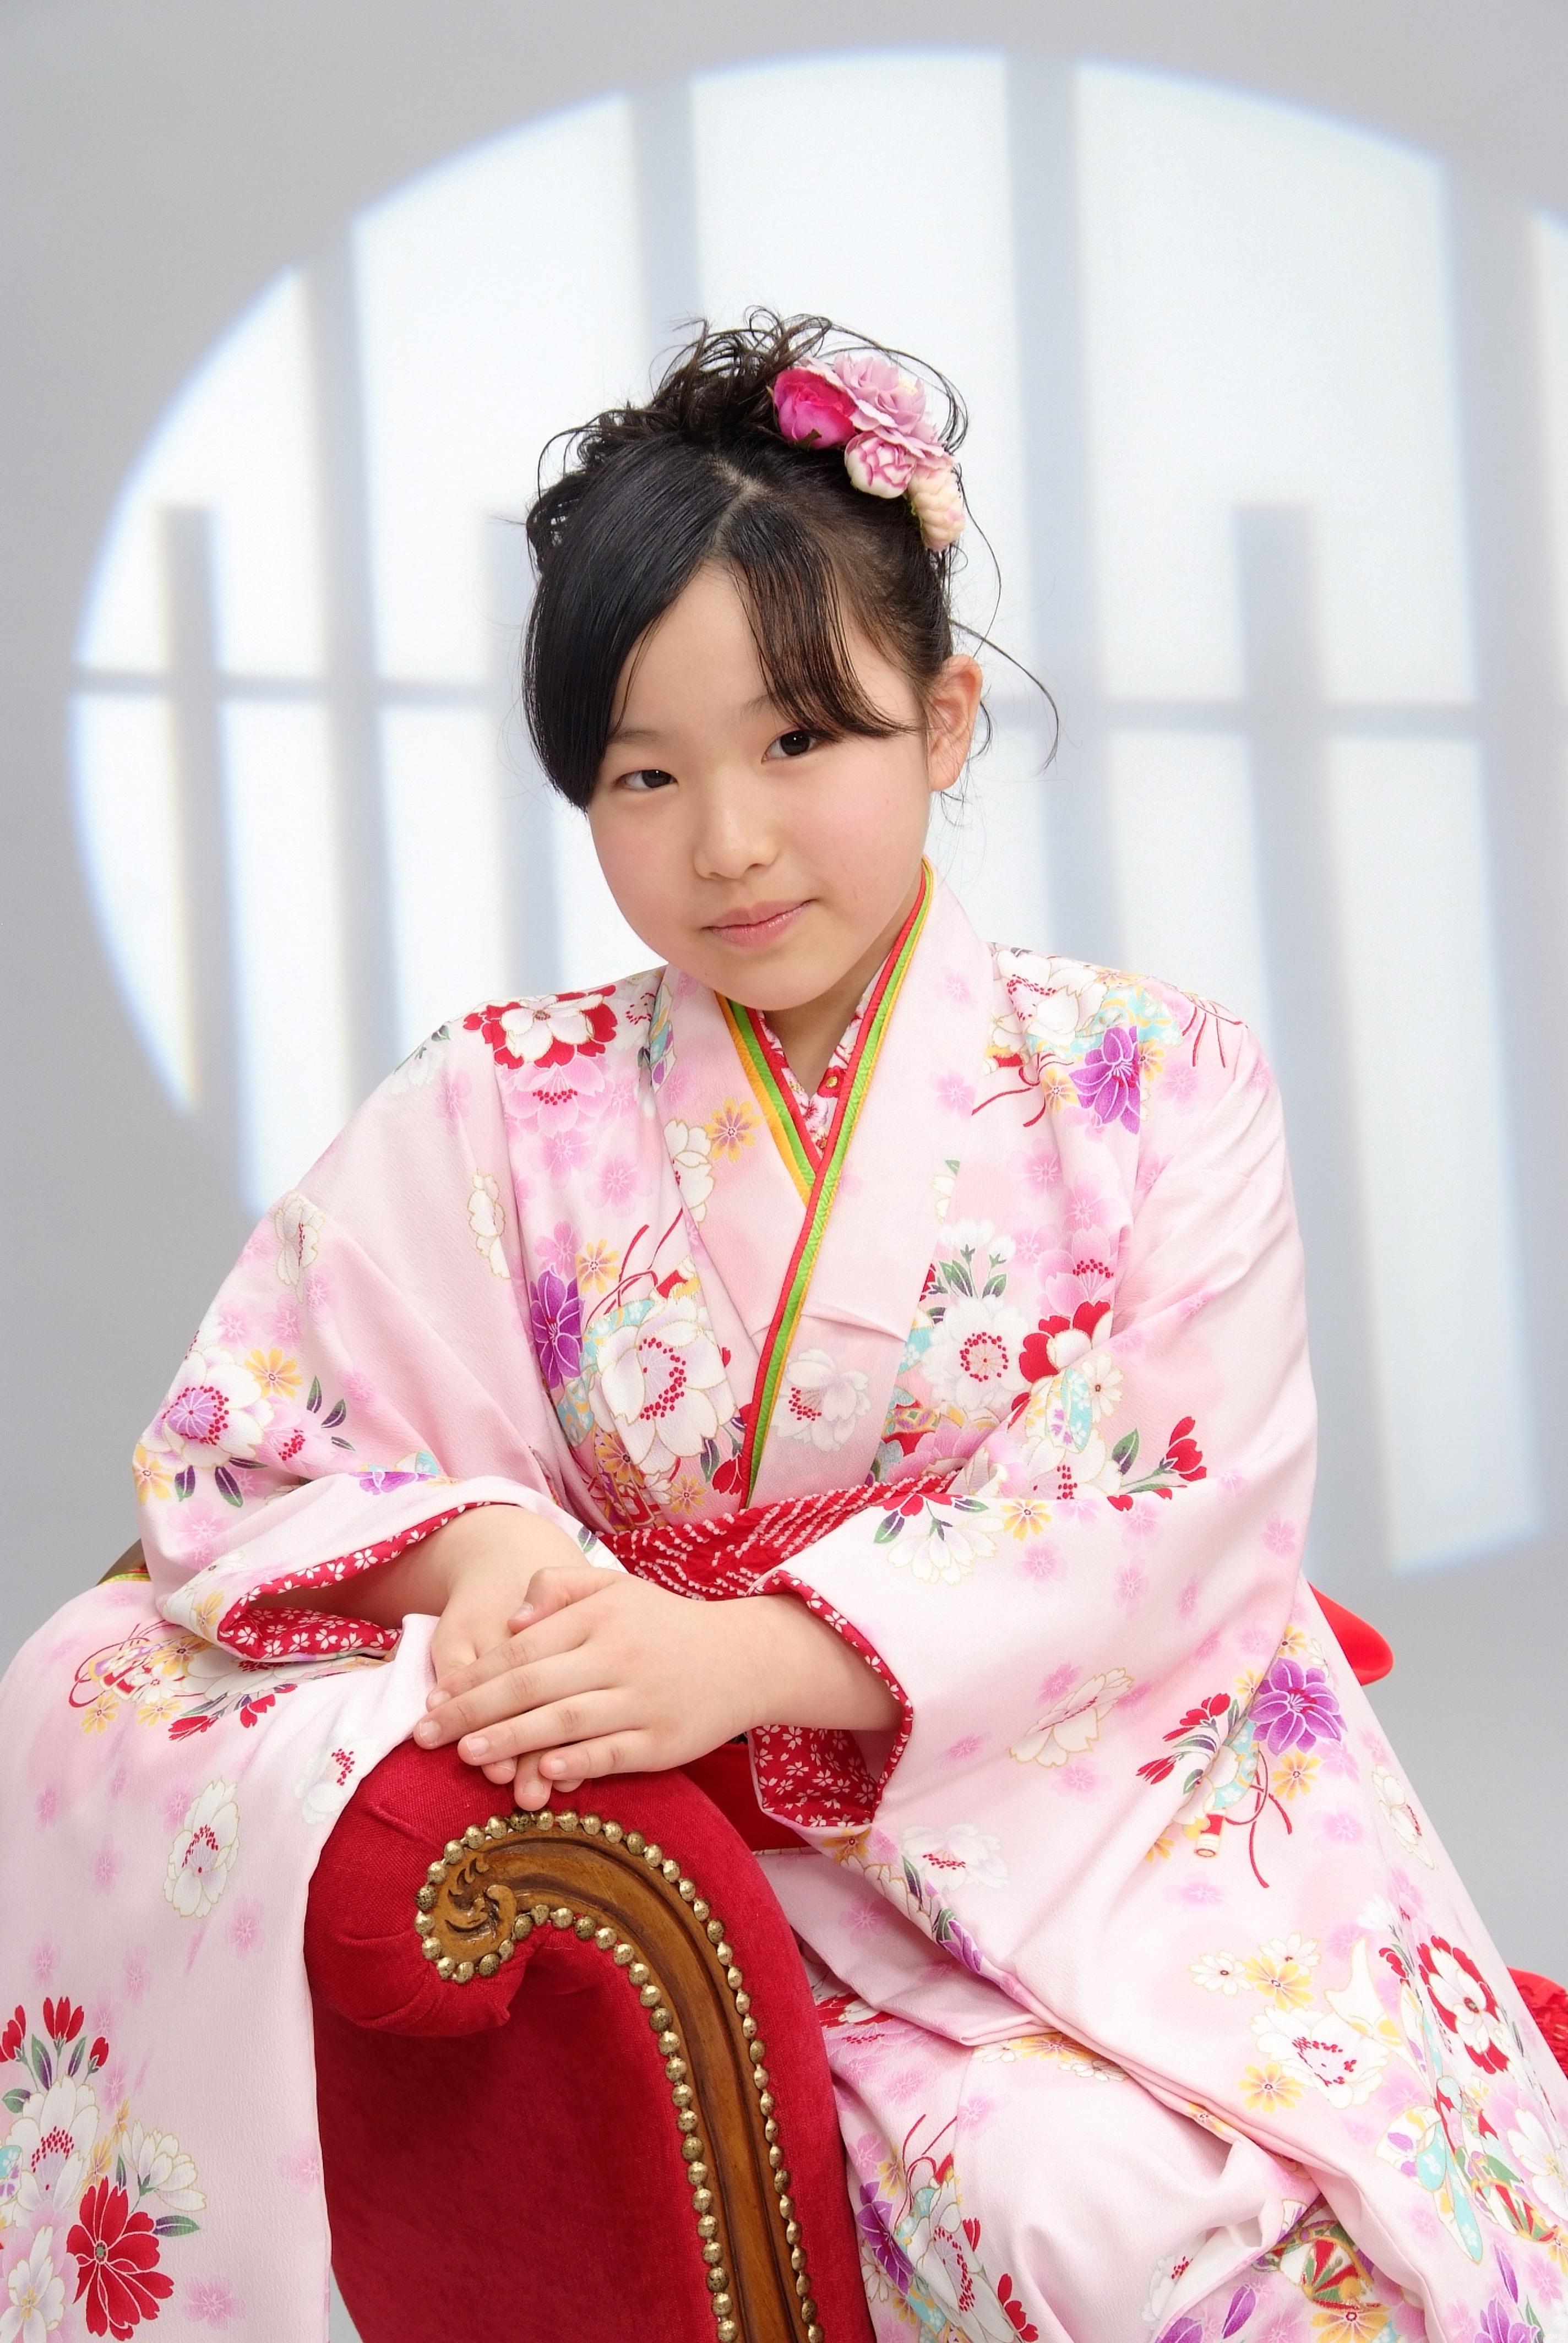 Fotos gratis : mujer, ropa, rosado, novia, kimono, vestir, norte, O ...